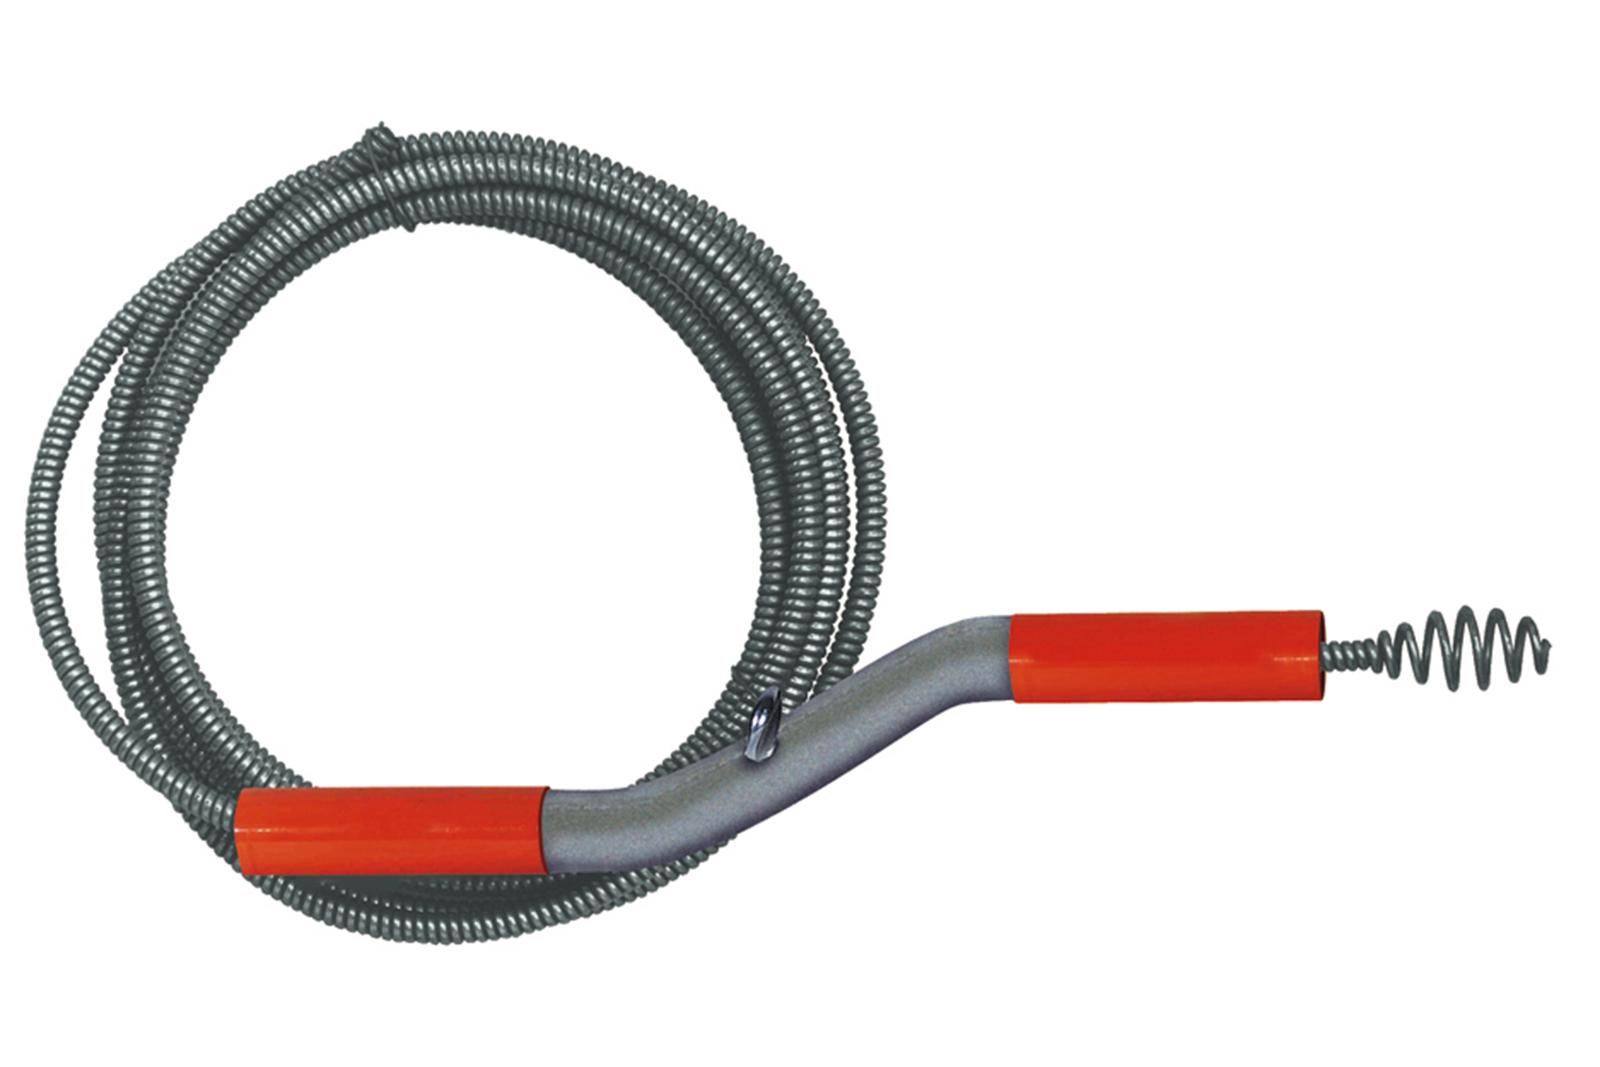 Купить Трос для прочистки General pipe Flexicore 35fl1